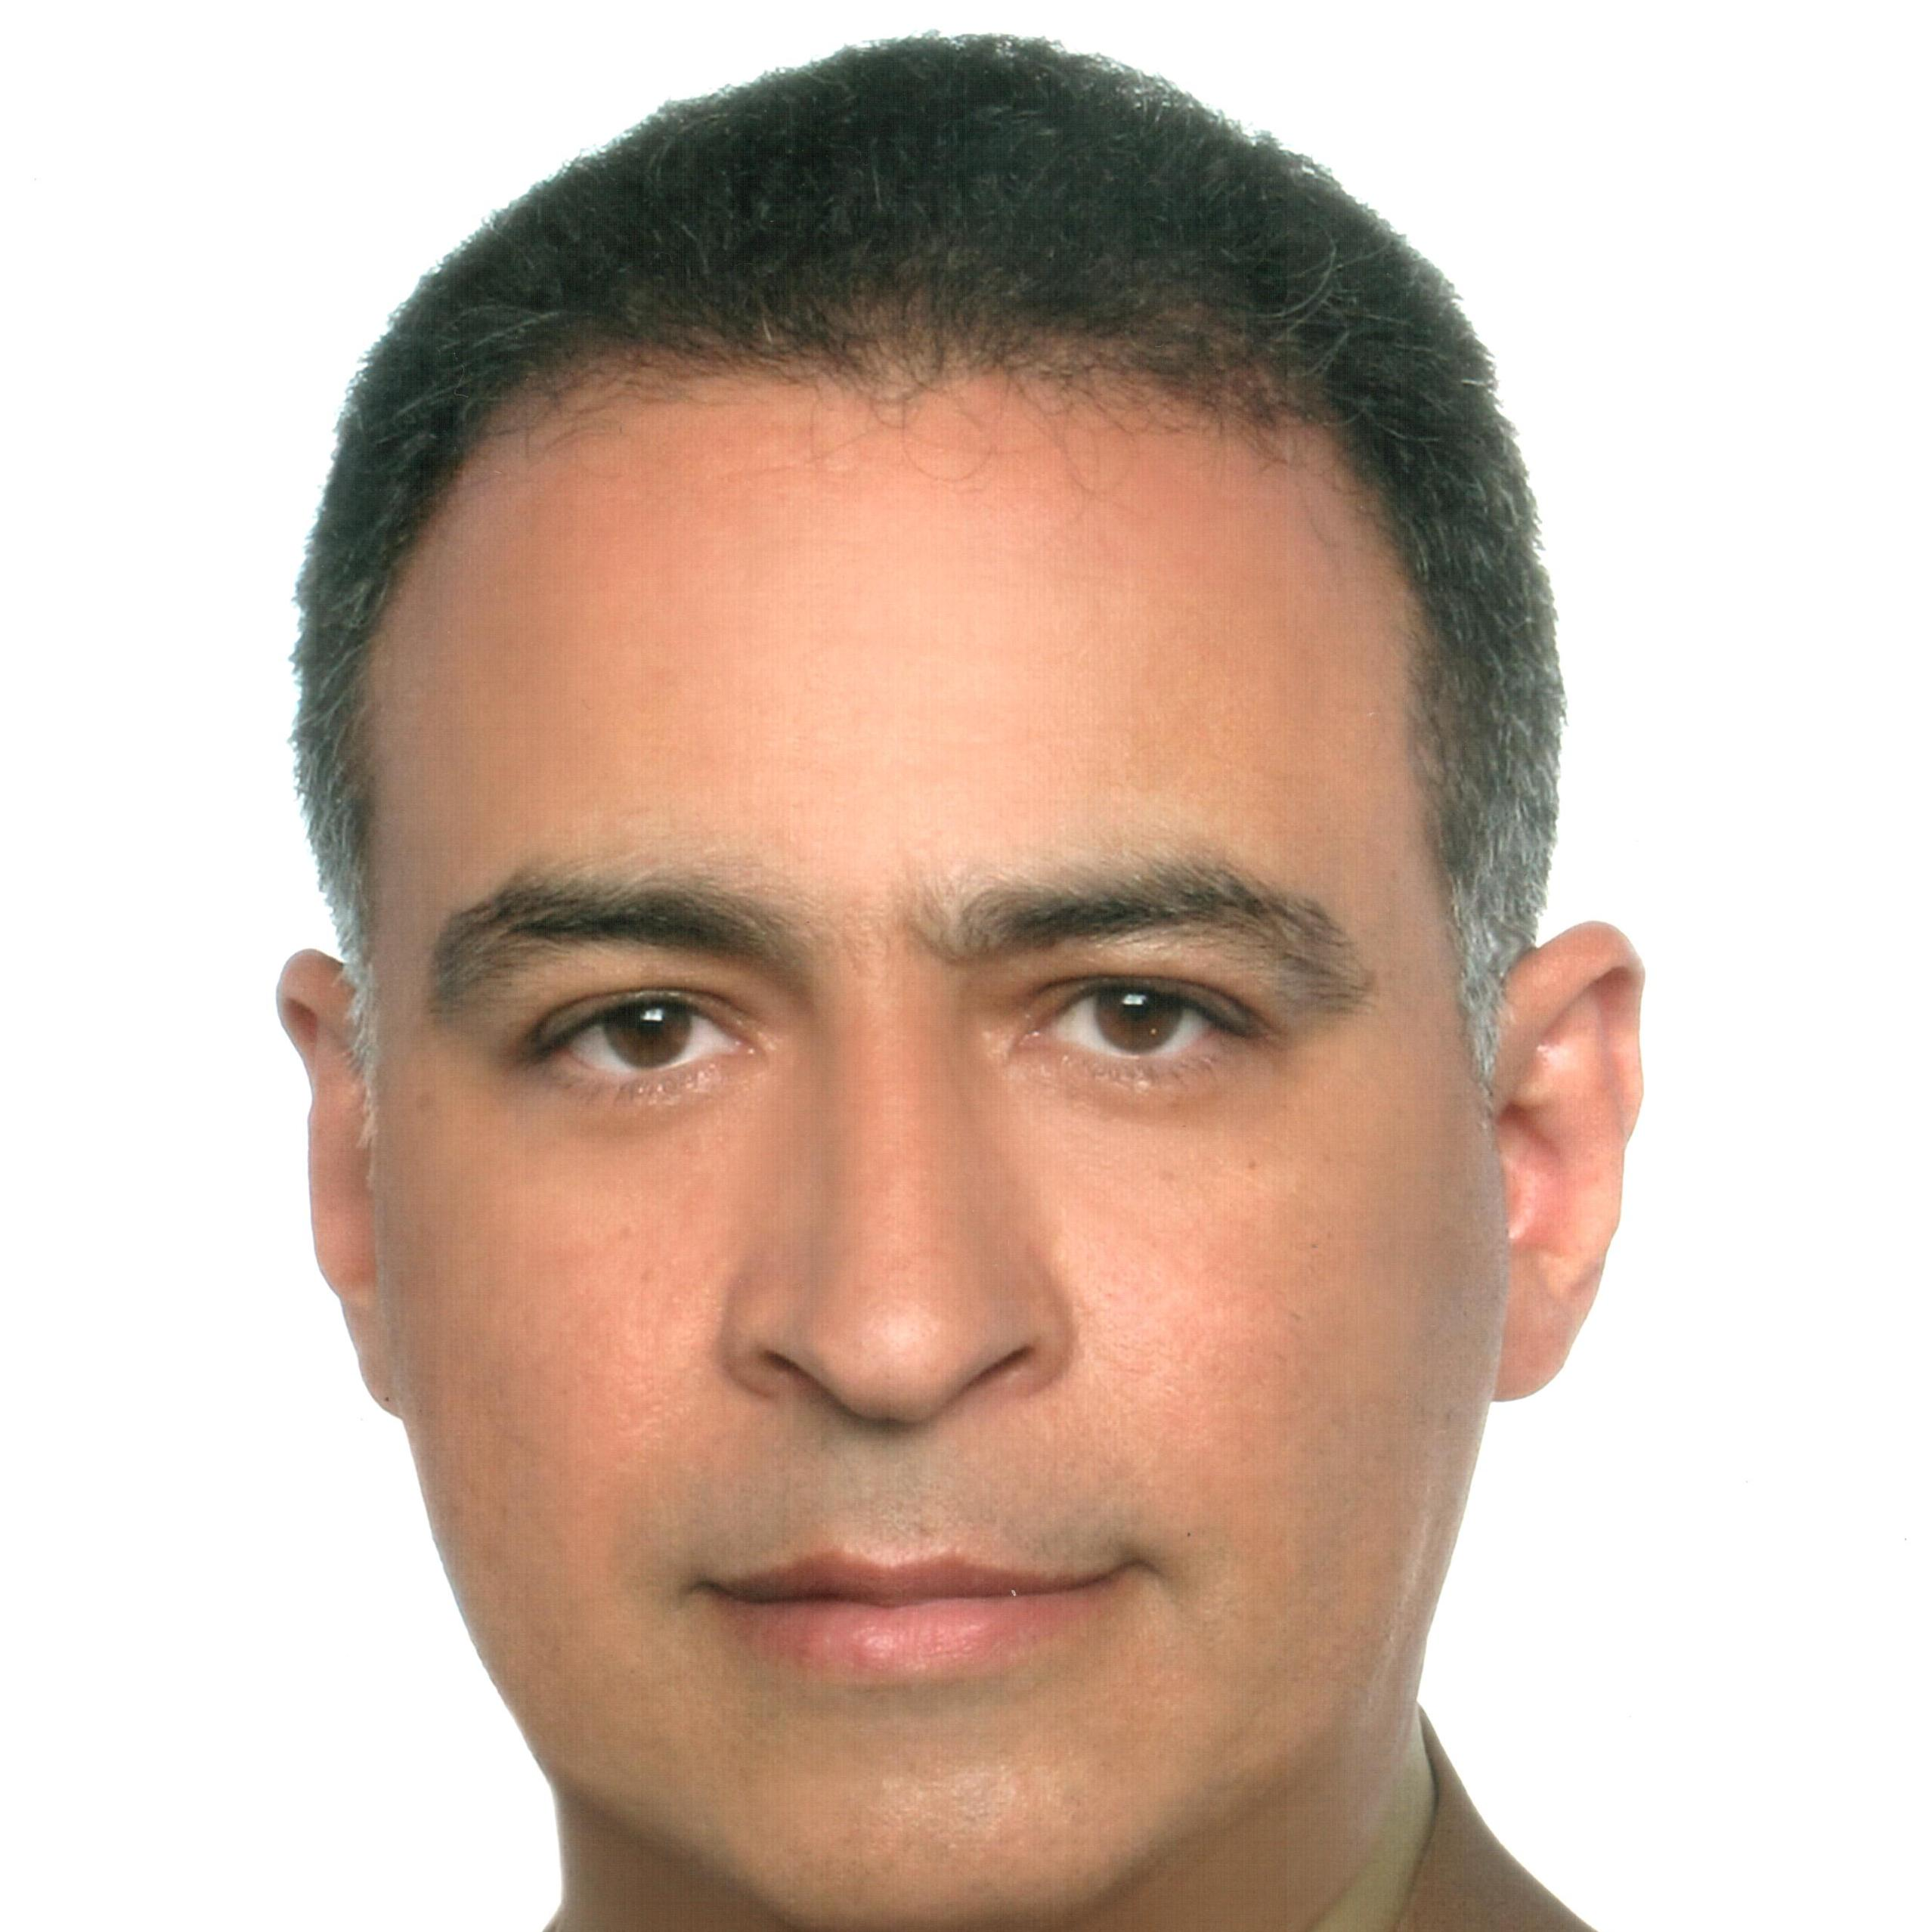 Humberto Salles Cordeiro